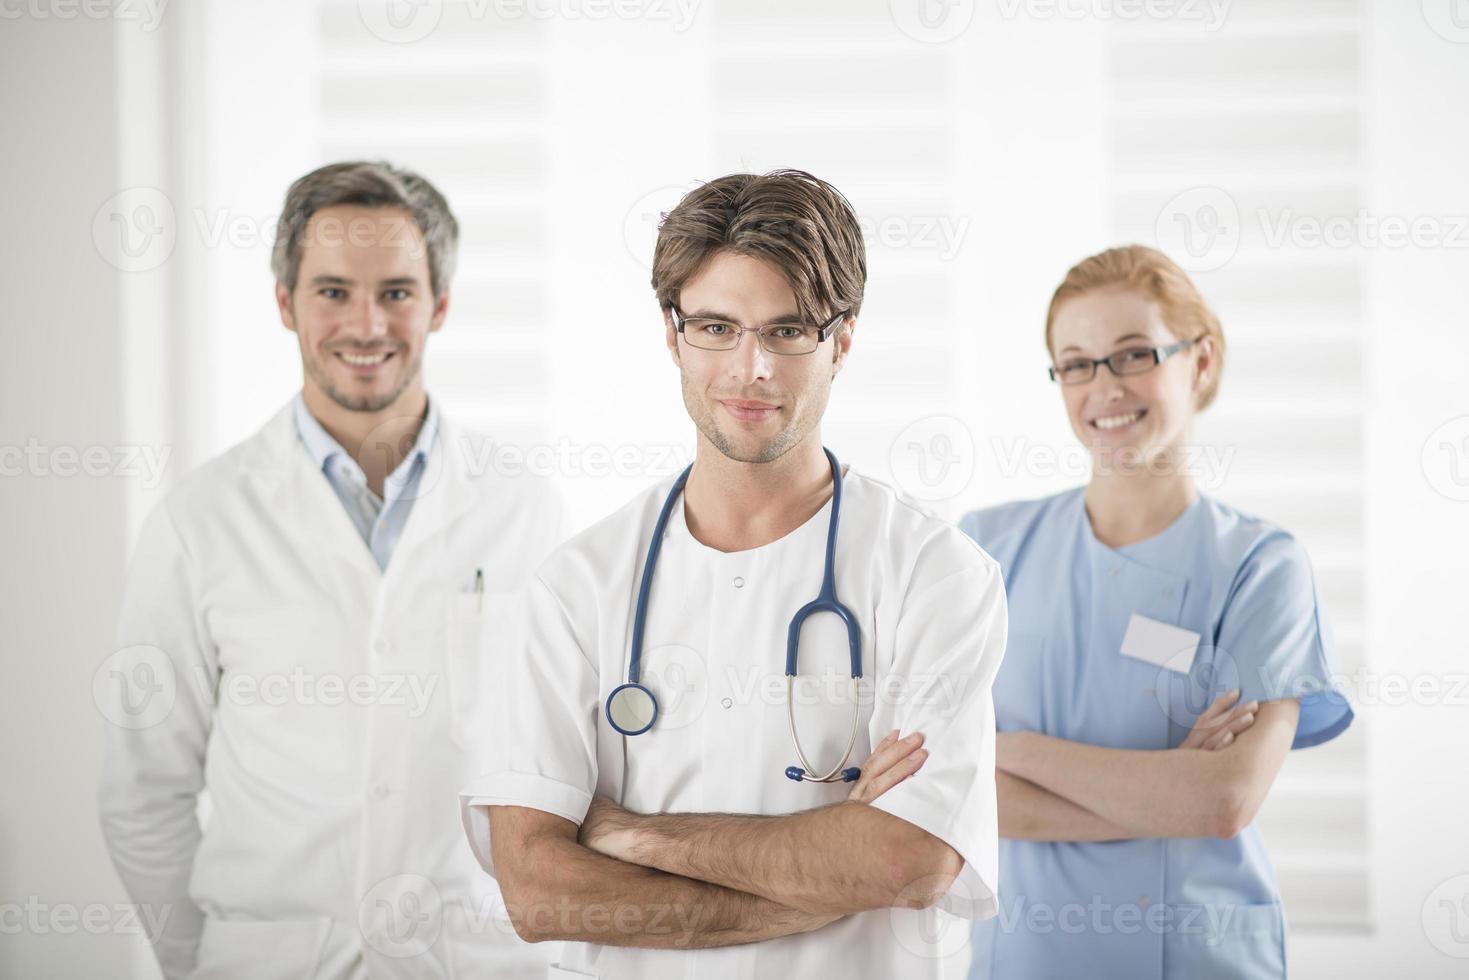 medical team portrait photo